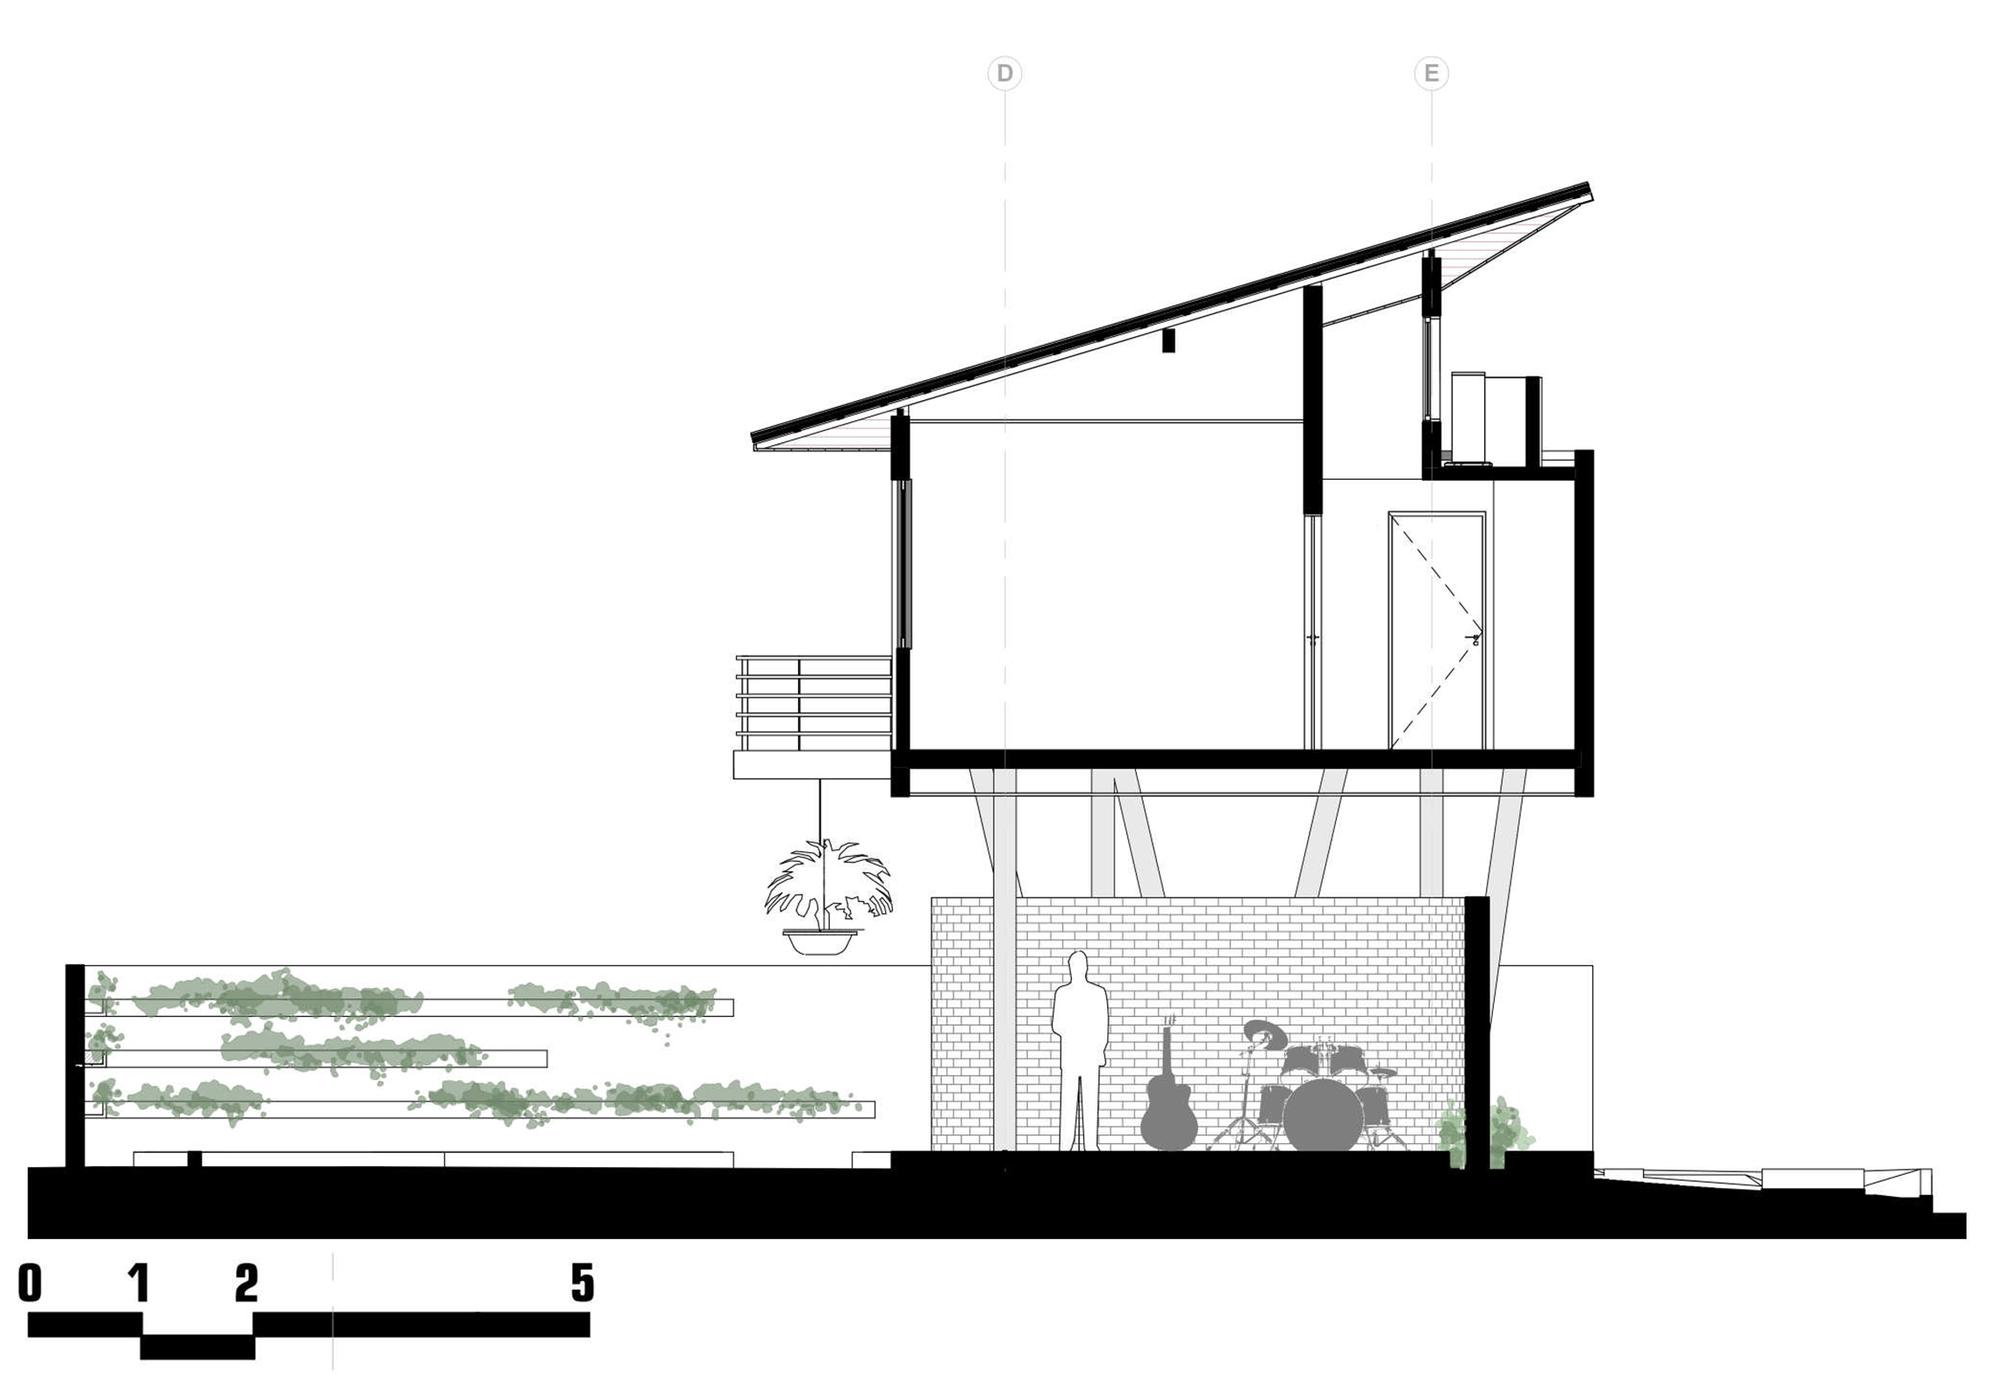 5448475ae58eceb567000185_architect-s-house-jirau-arquitetura_casa-001-pe-executivo_corte_bb-r02